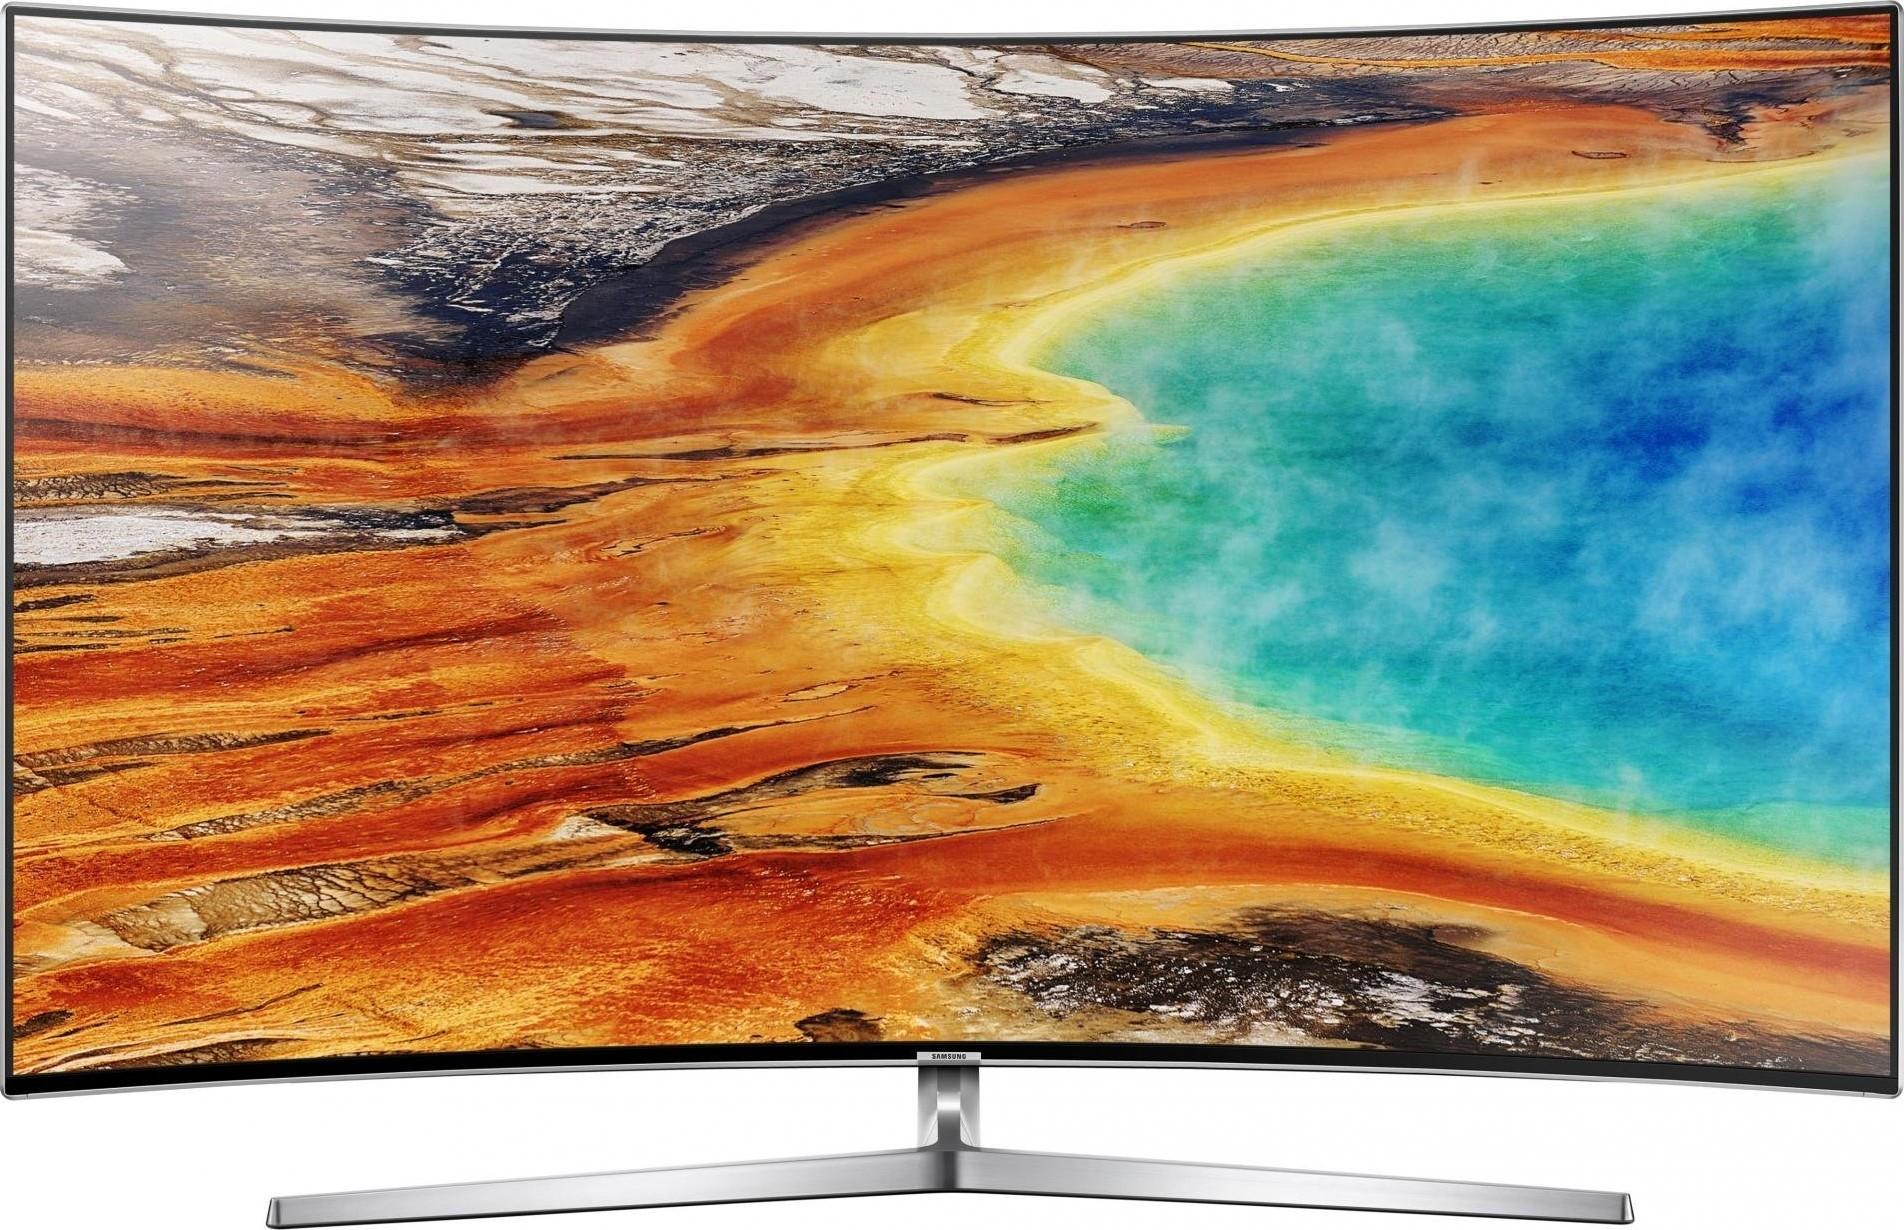 Samsung UE55MU9002